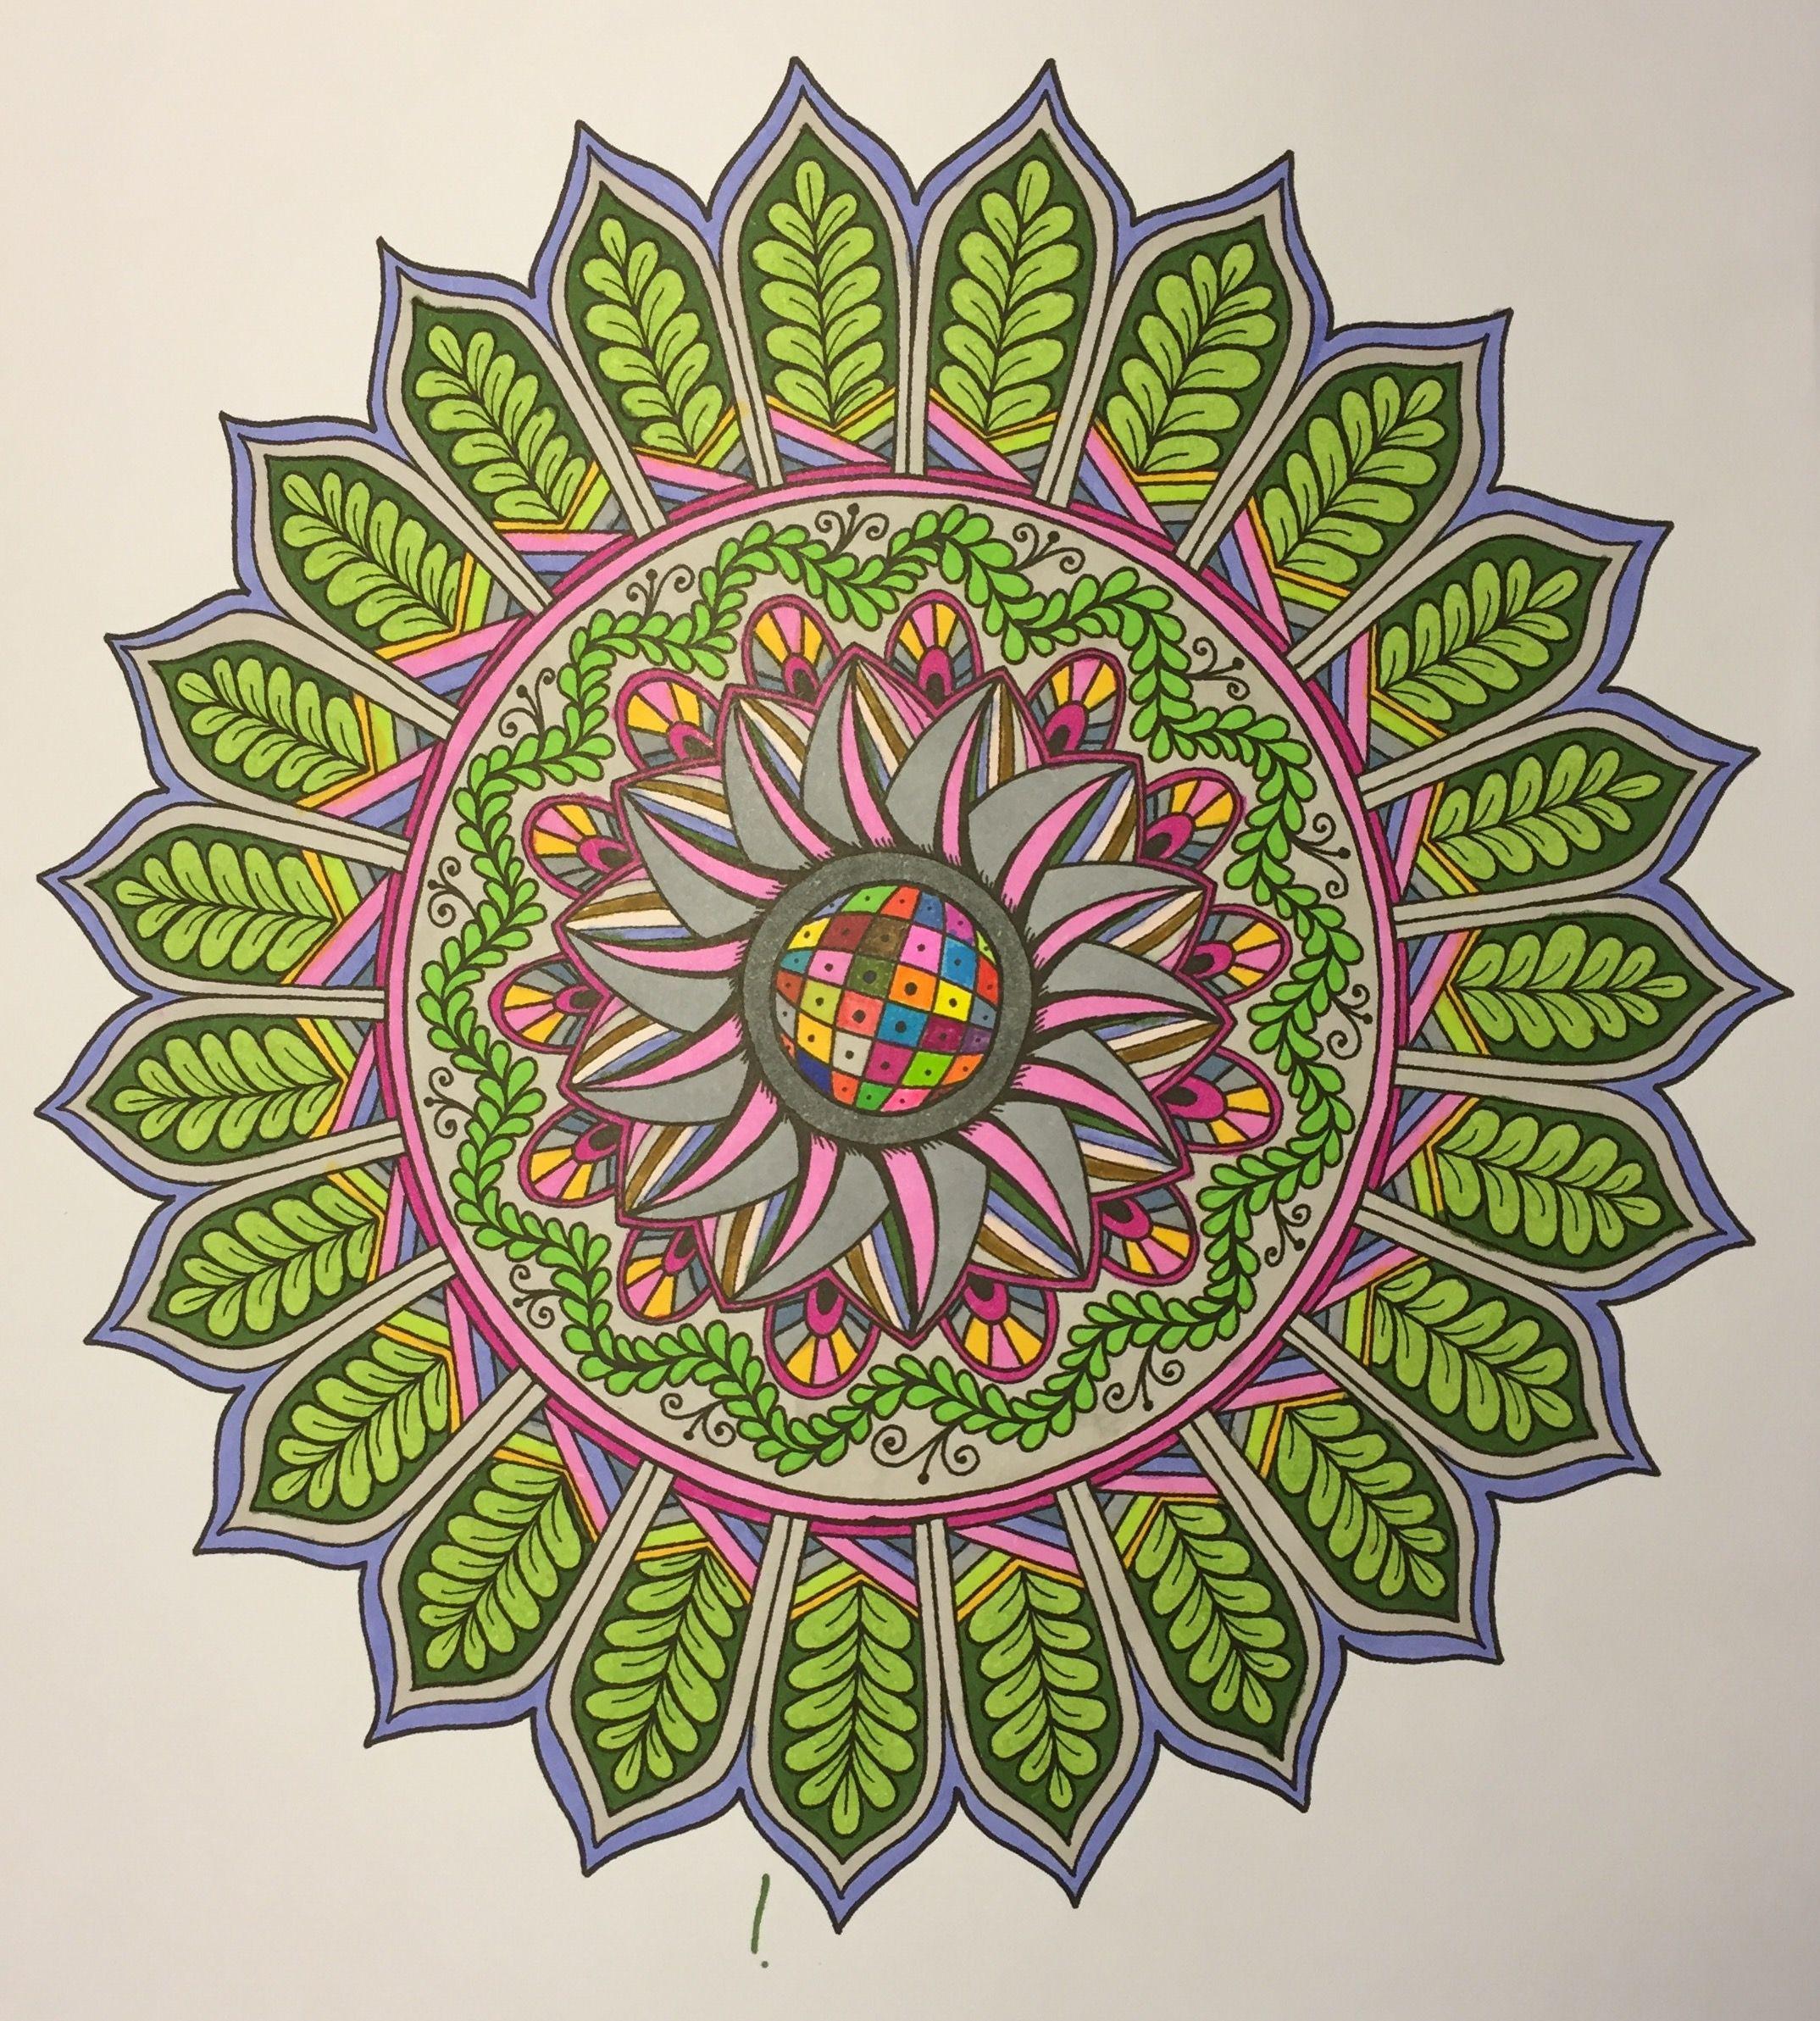 Zendoodle coloring enchanting gardens - Adult Coloring Zentangle Artsy Fartsy Doodle Mandalas